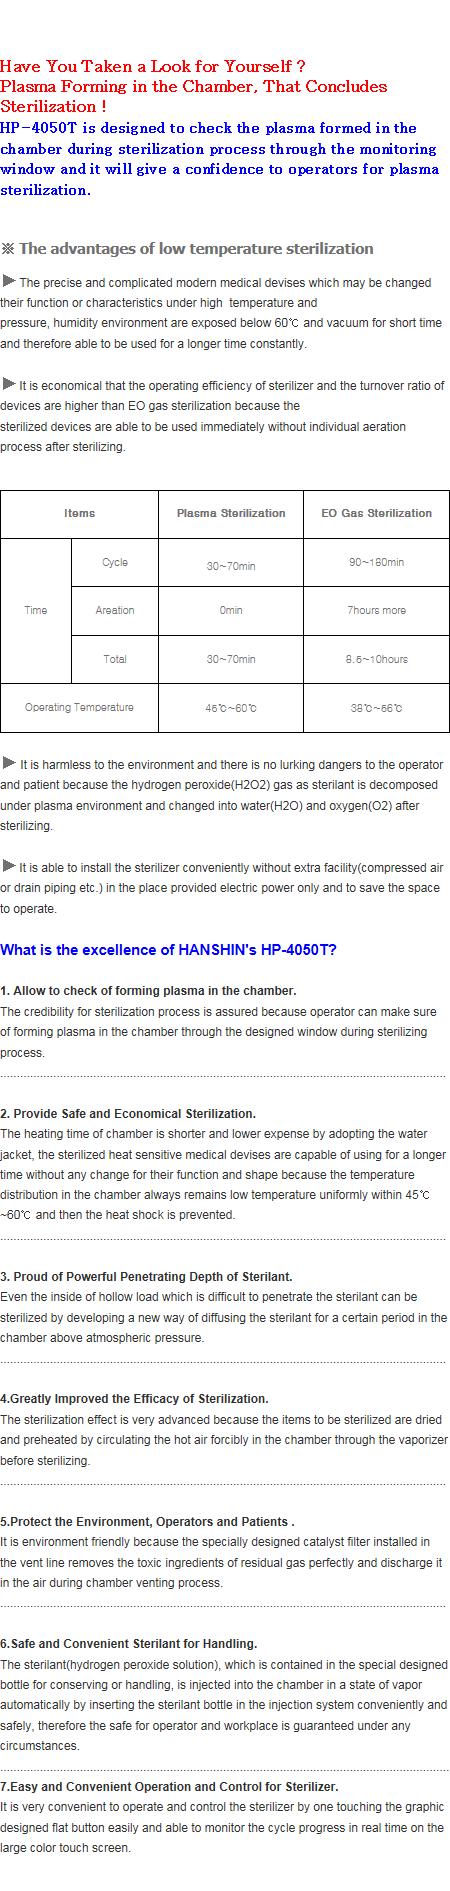 HANSHIN MEDICAL 50 liters HP-4050T 1